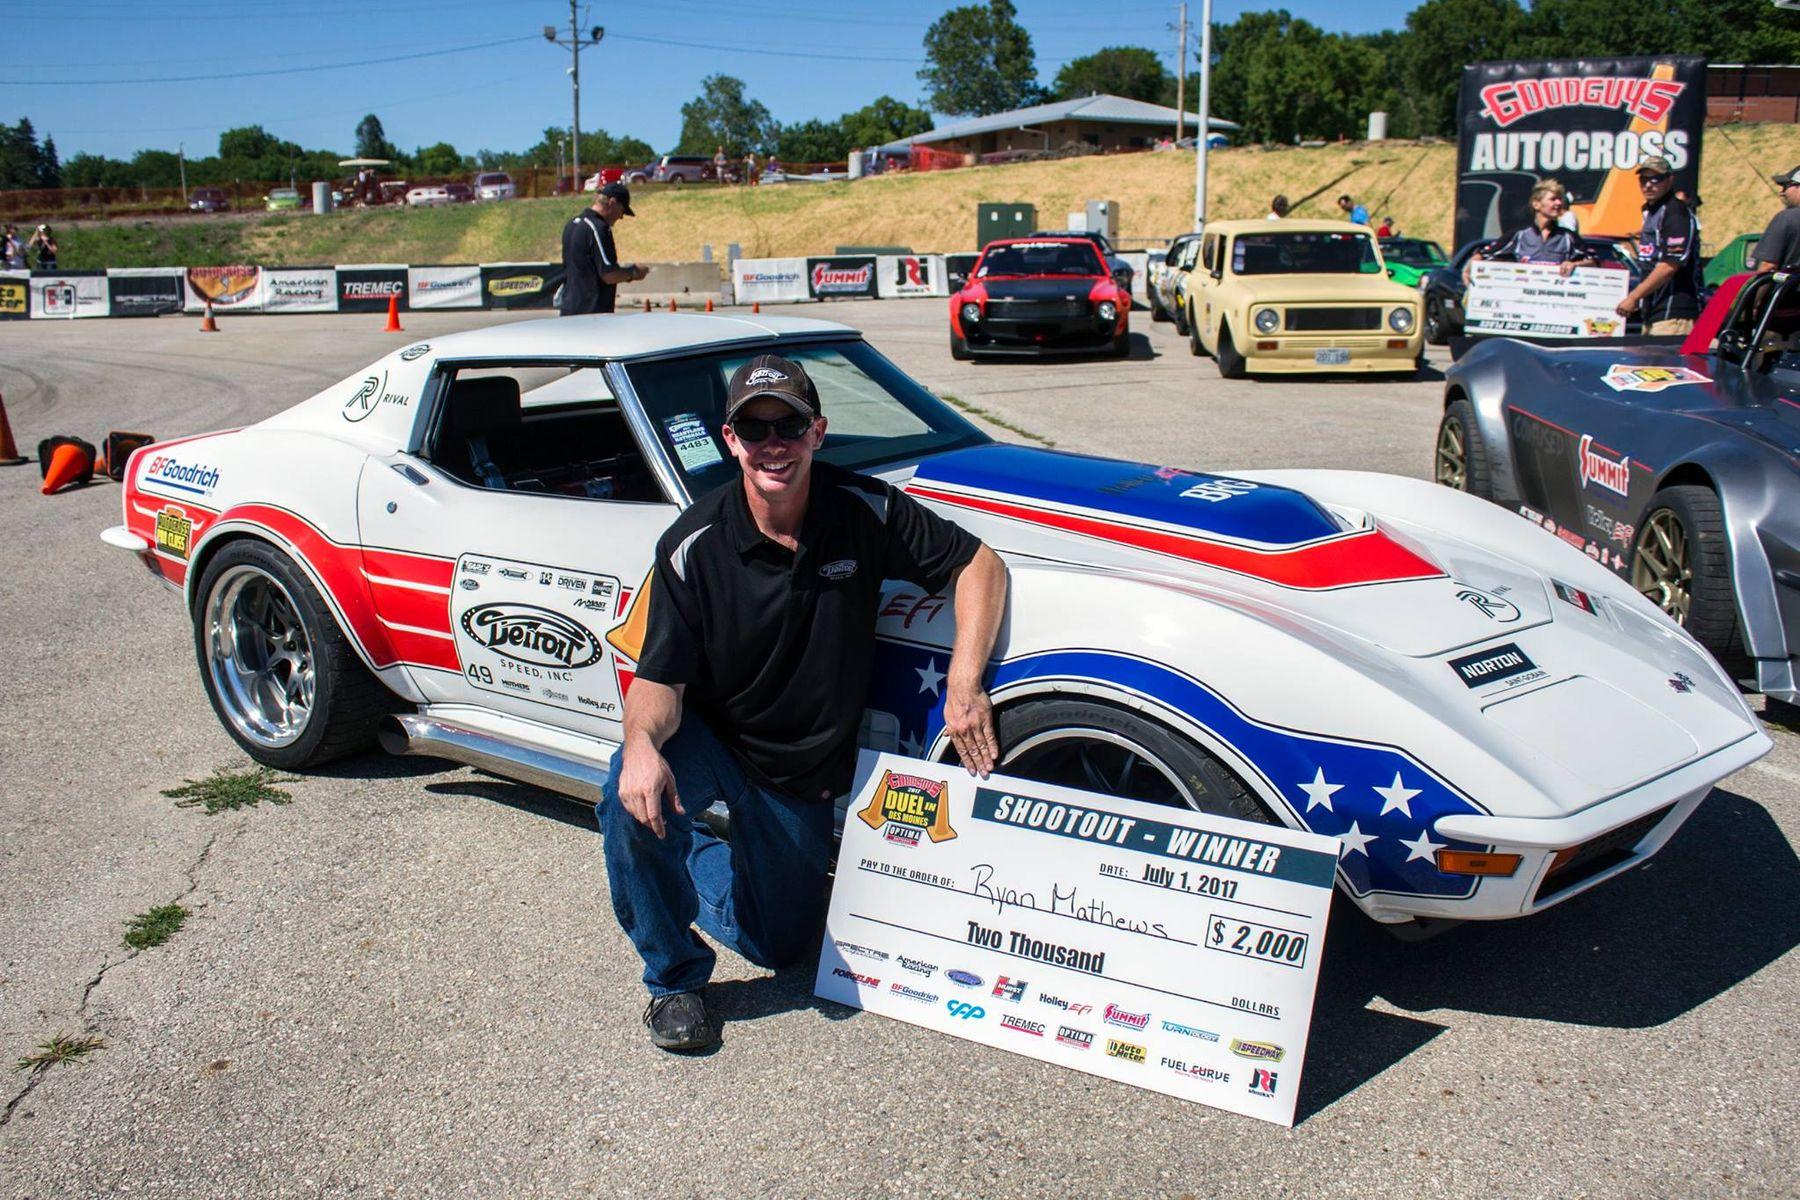 1972 Chevrolet Corvette Stingray | Ryan Mathews Wins Goodguys Heartland Nationals Autocross in the Detroit Speed C3 Corvette on Forgeline GA3 Wheels